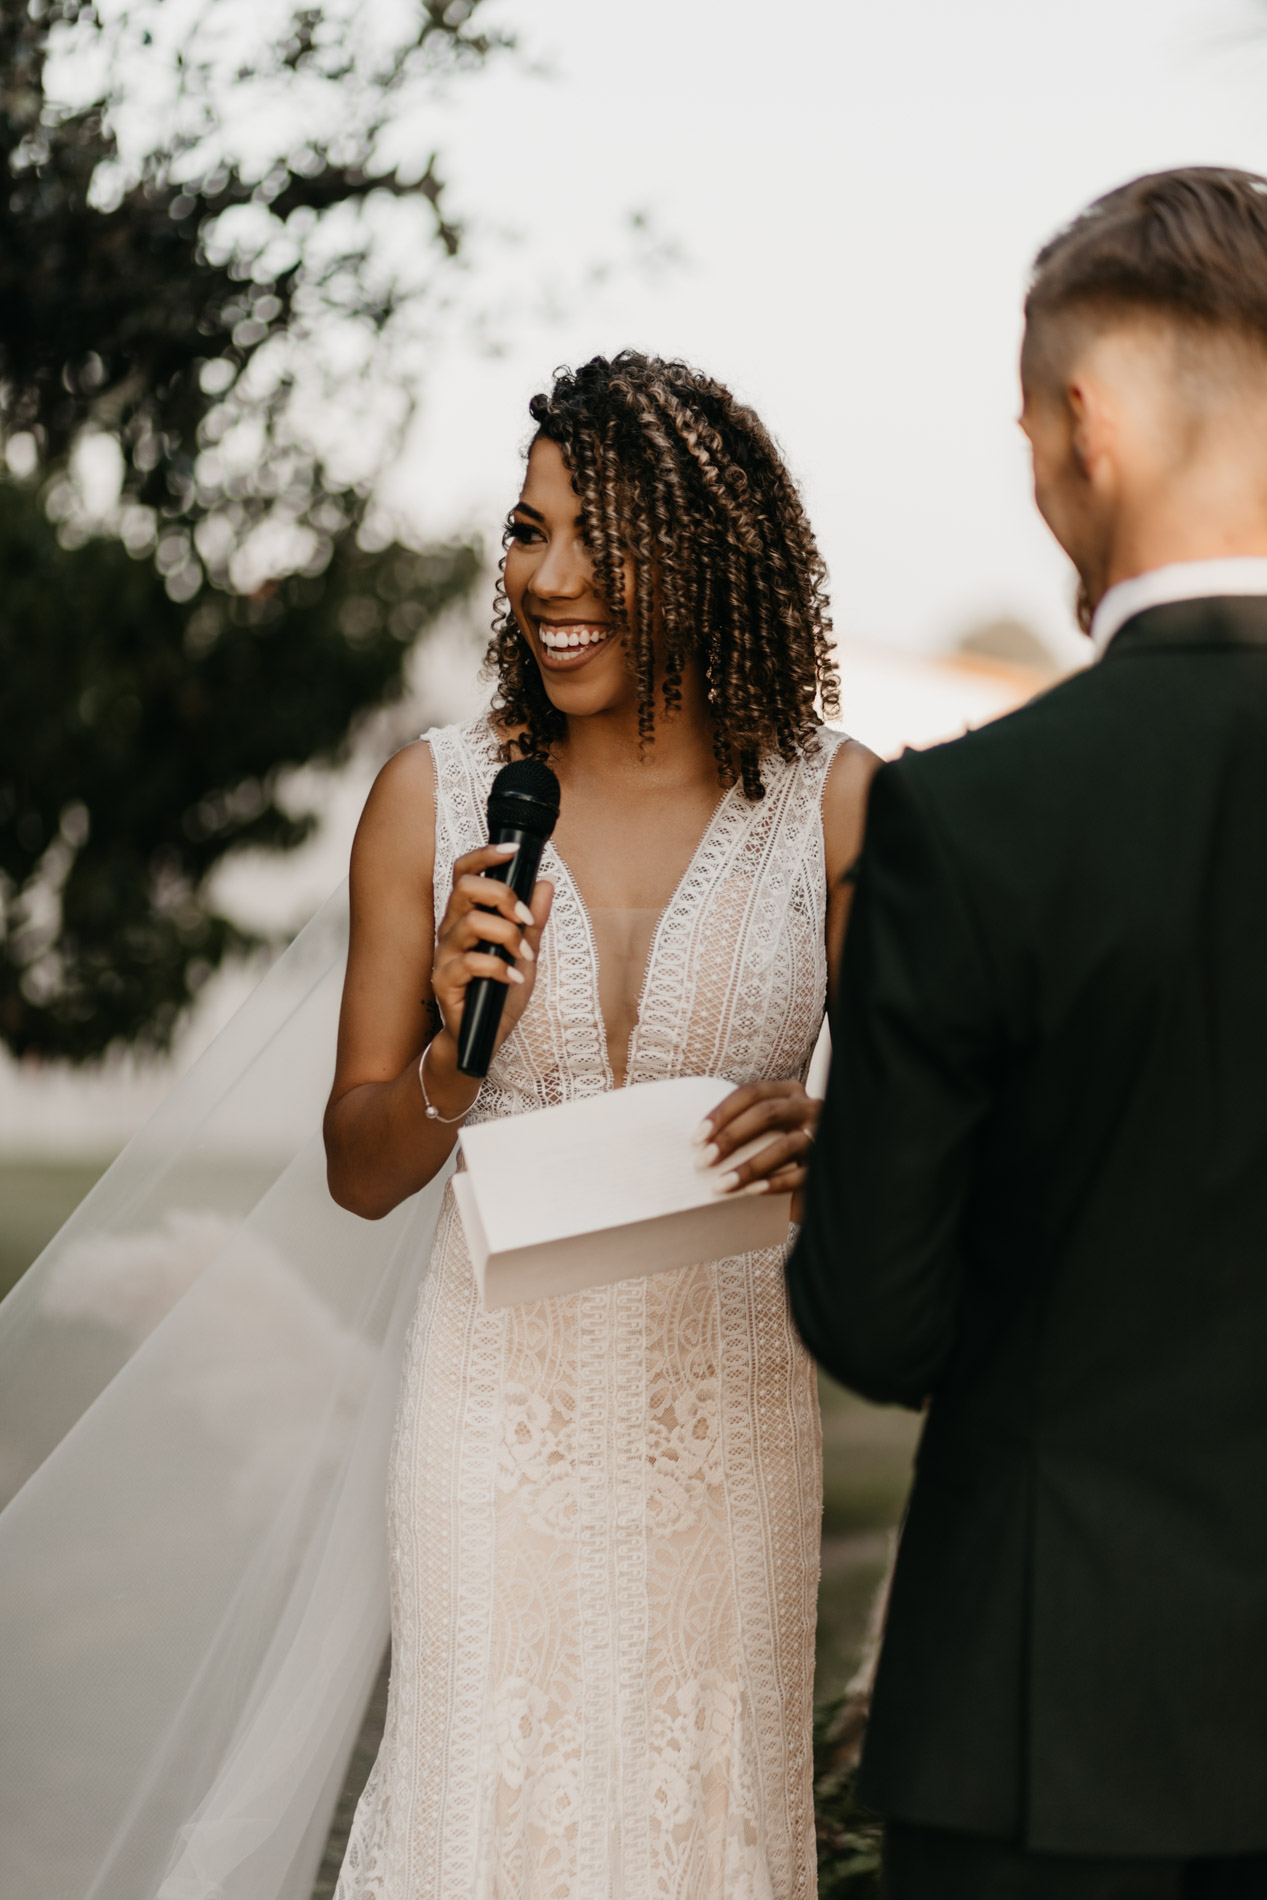 Bride reading her wedding vows